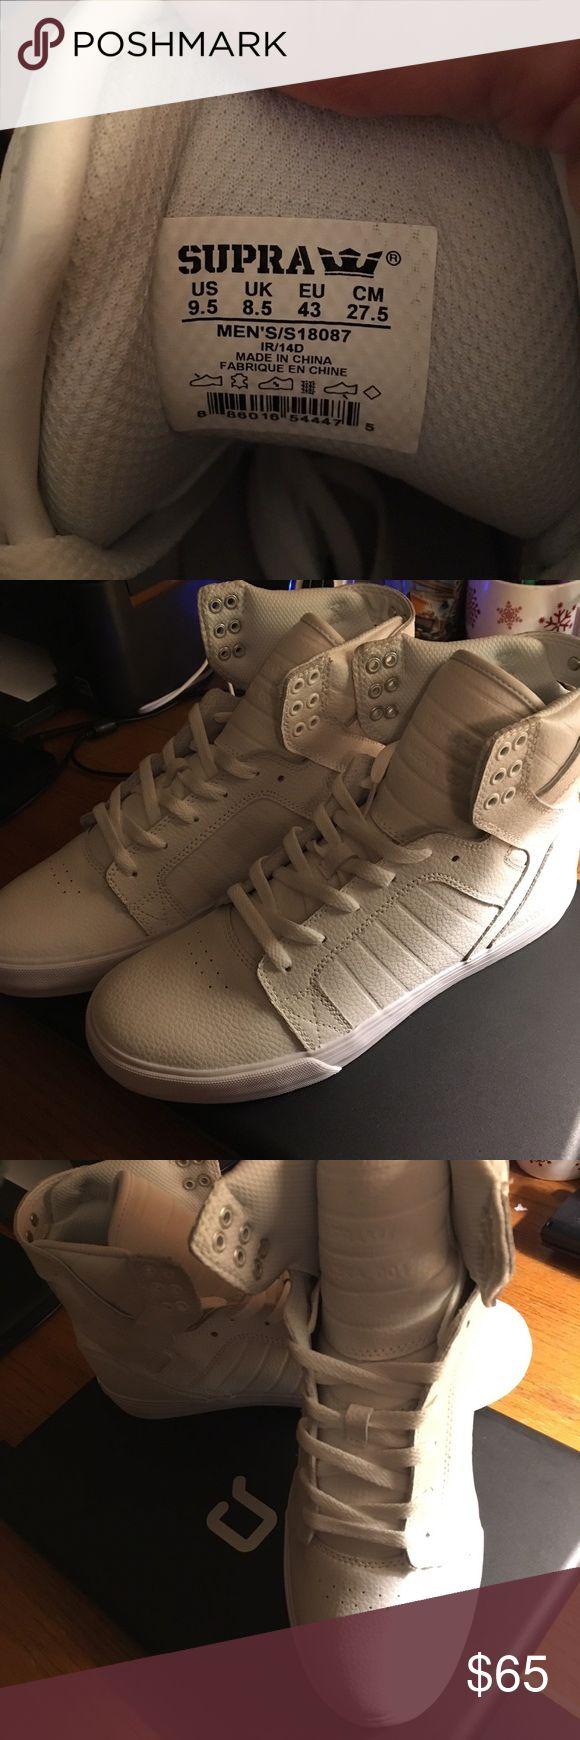 Men's Supra hightop shoes New hightop Supra shoes men's size 9.5 Supra Shoes Sneakers